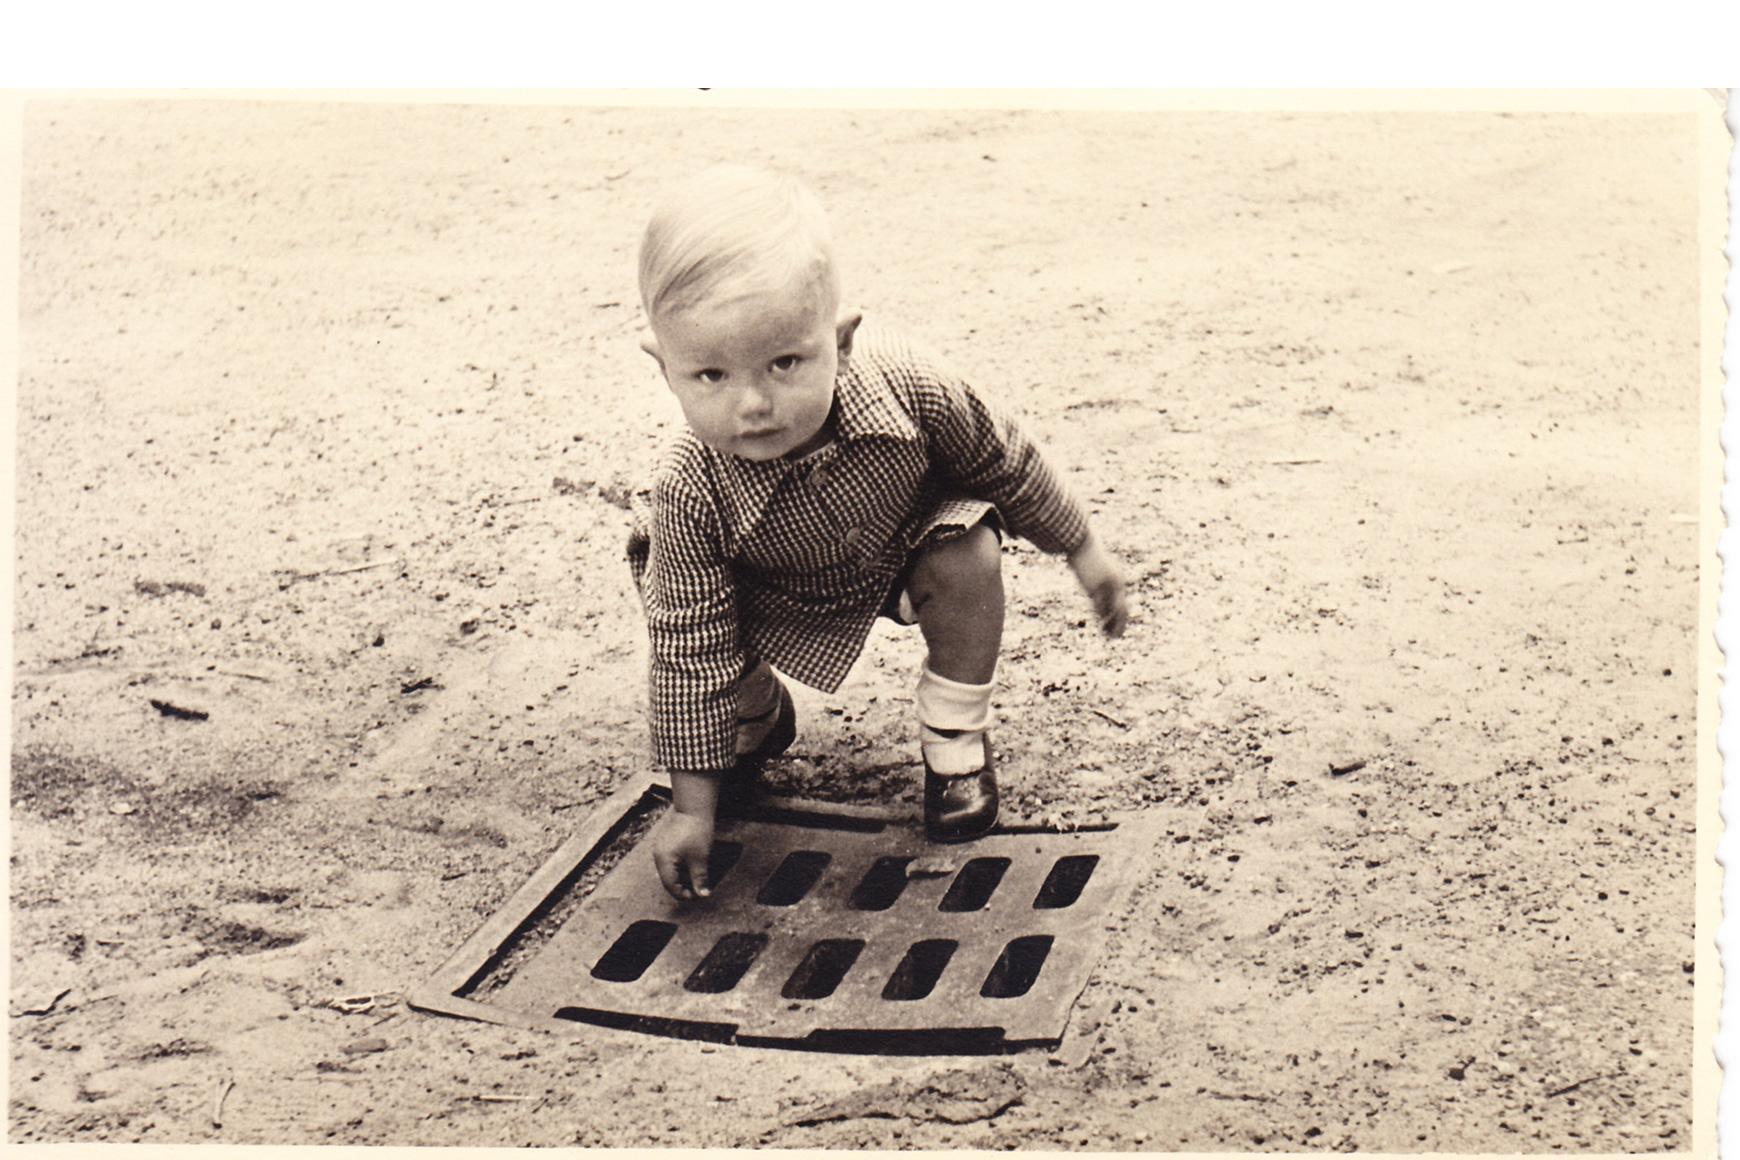 Fotograaf onbekend, Zuid-Nederland, ca 1952 / Collectie Margit Willems